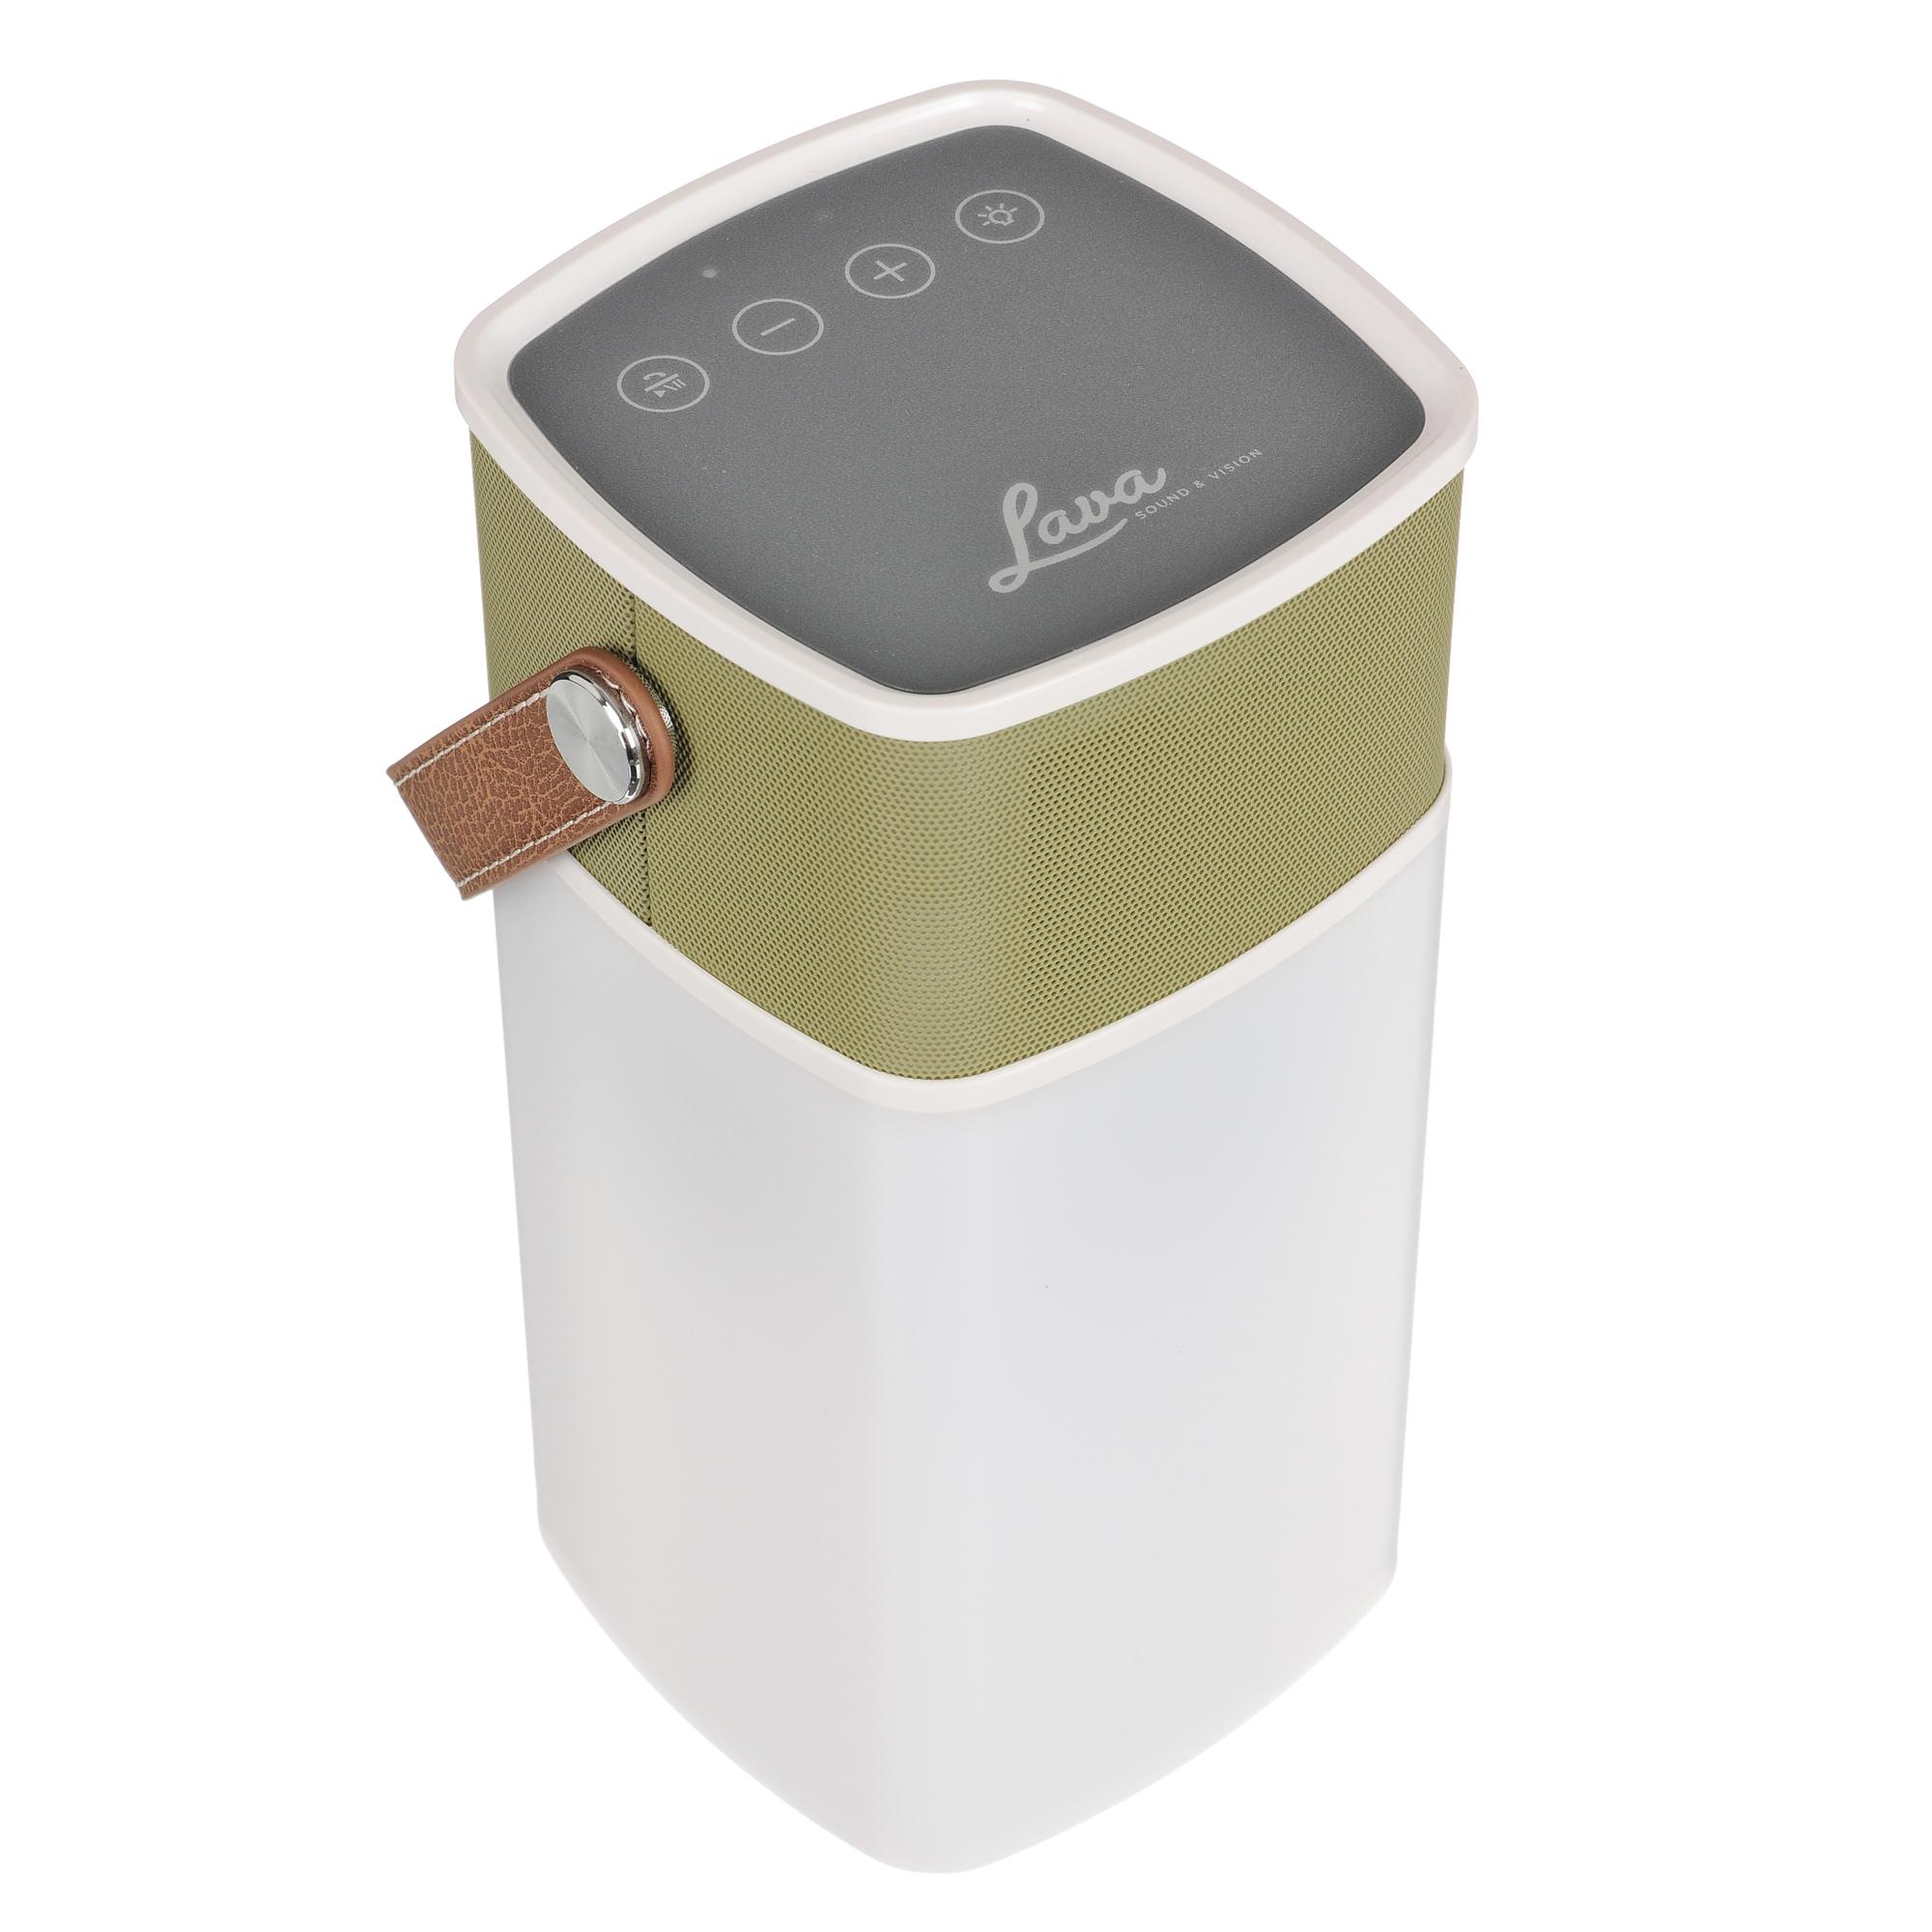 Lava BrightSounds Altavoz Bluetooth 2, batería de linterna, teléfono Powerbank, mostaza